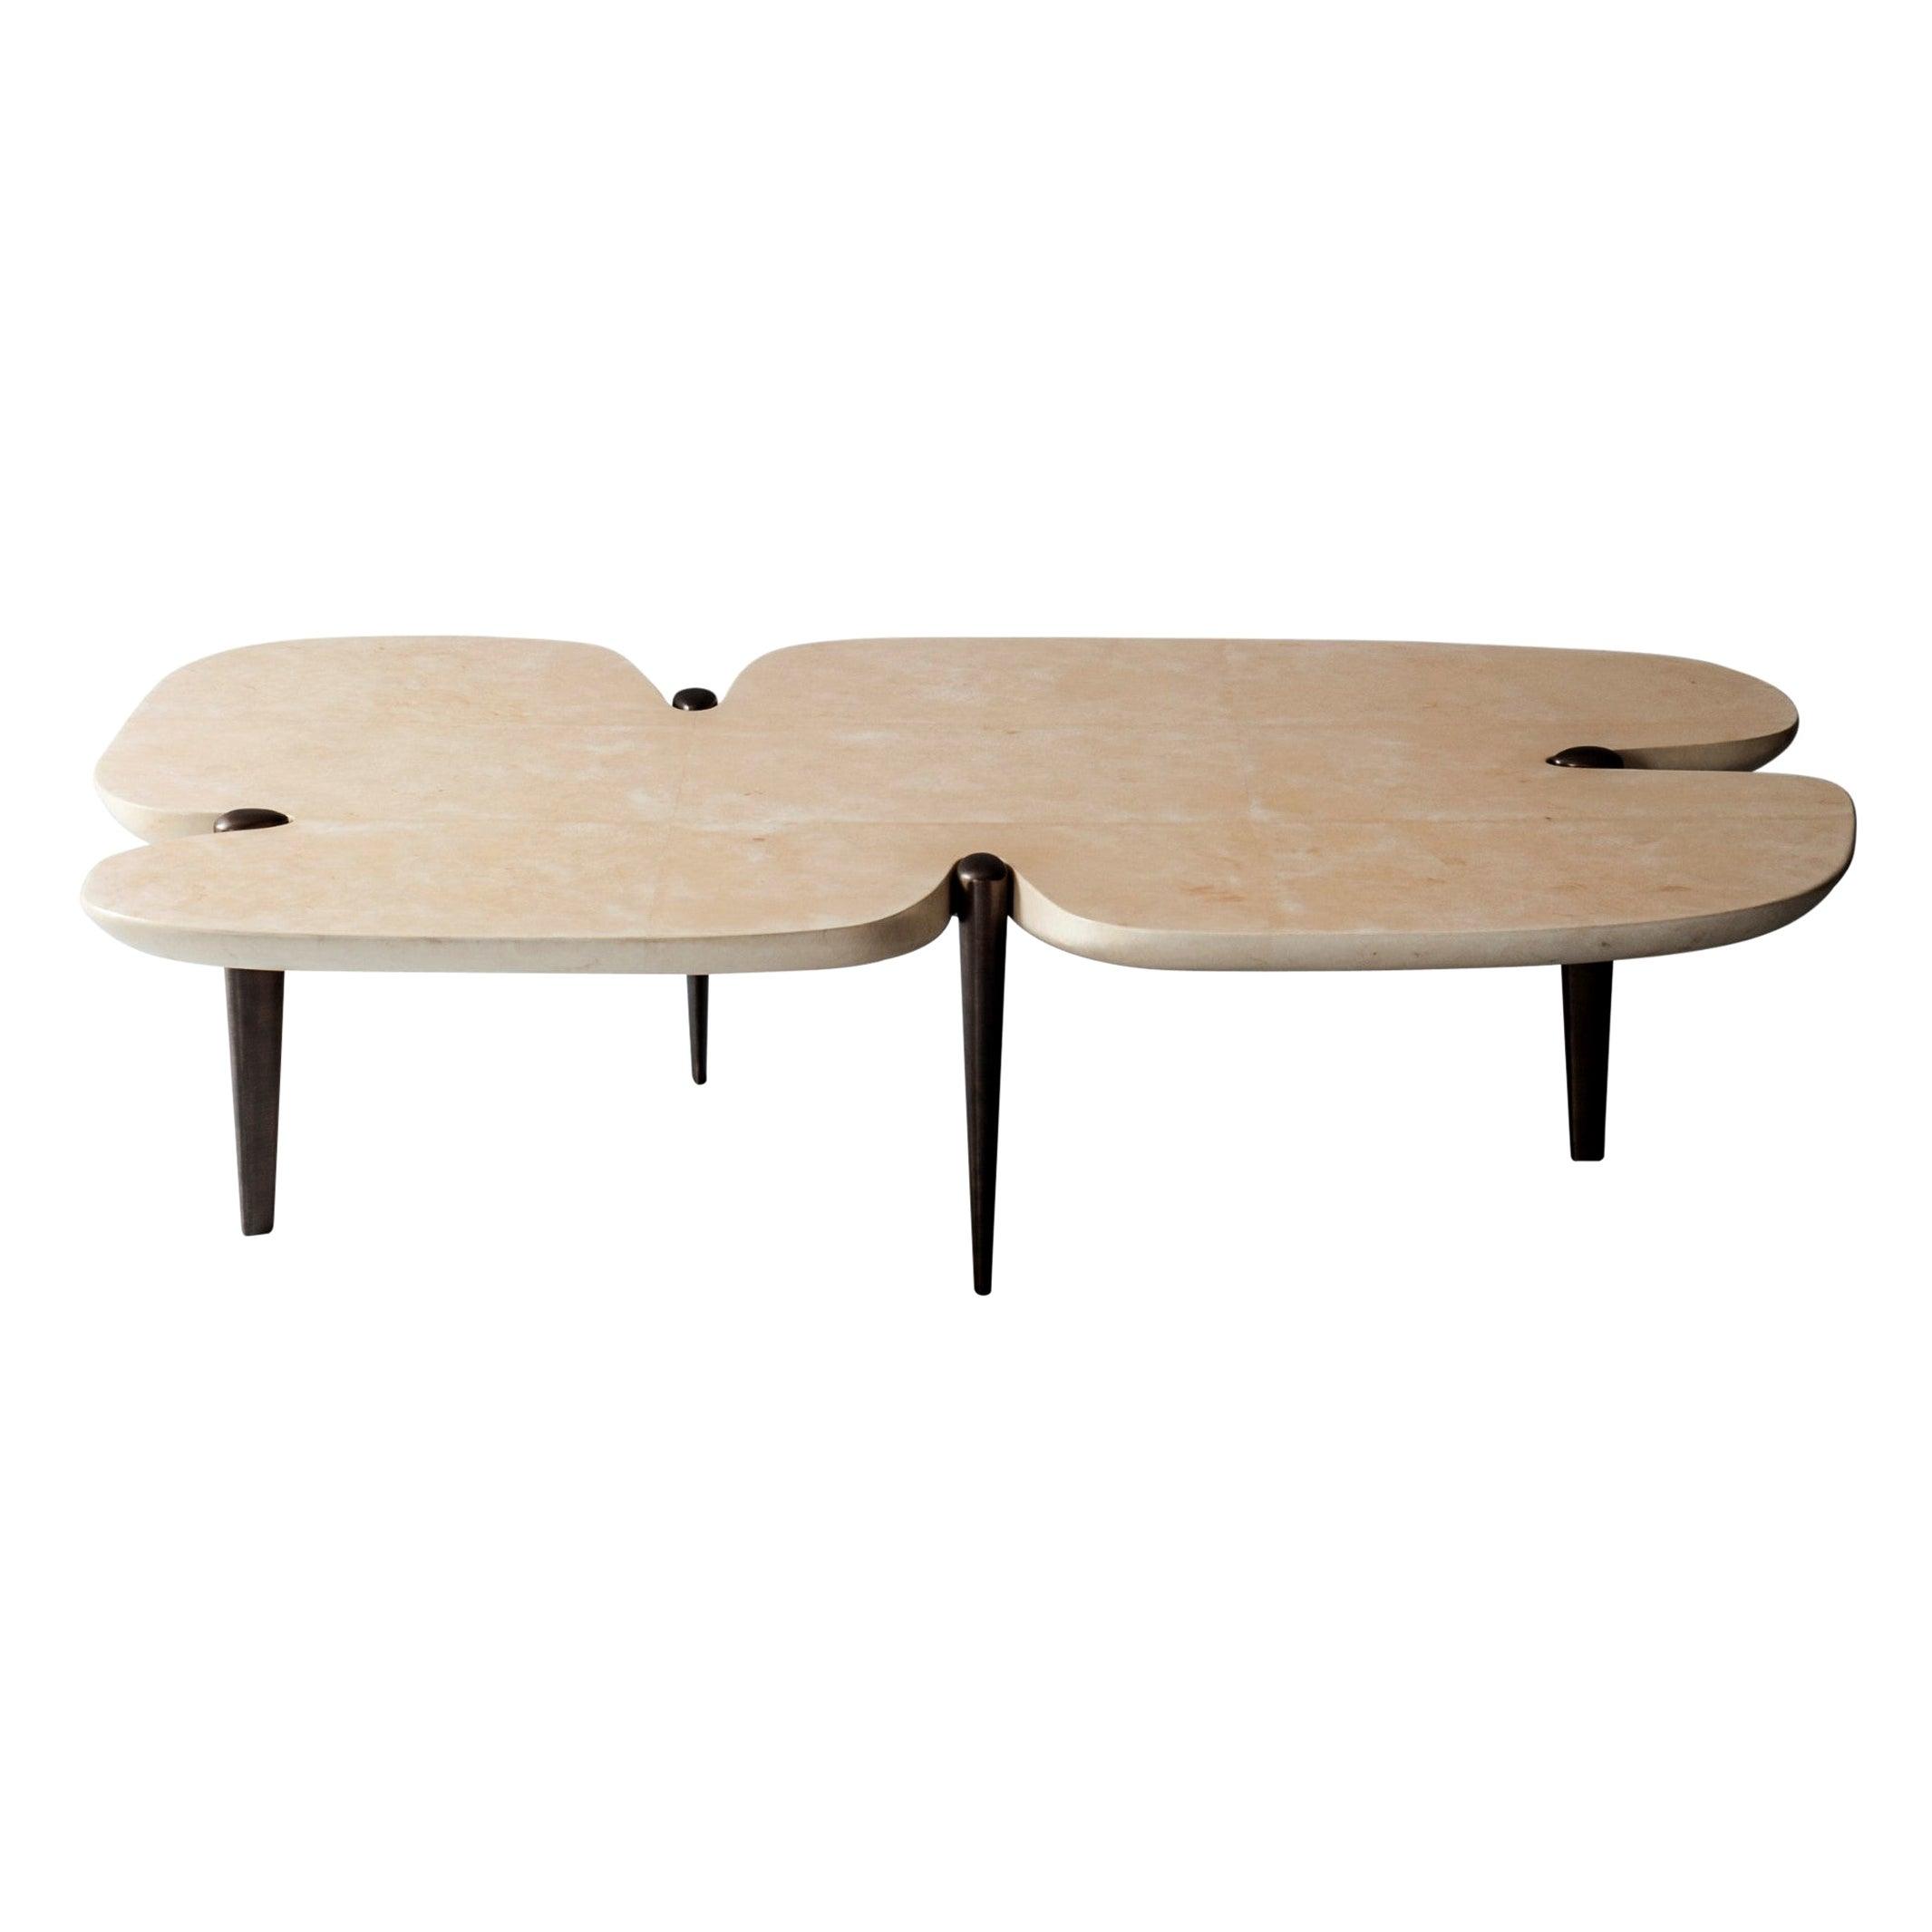 Contour Coffee Table by DeMuro Das